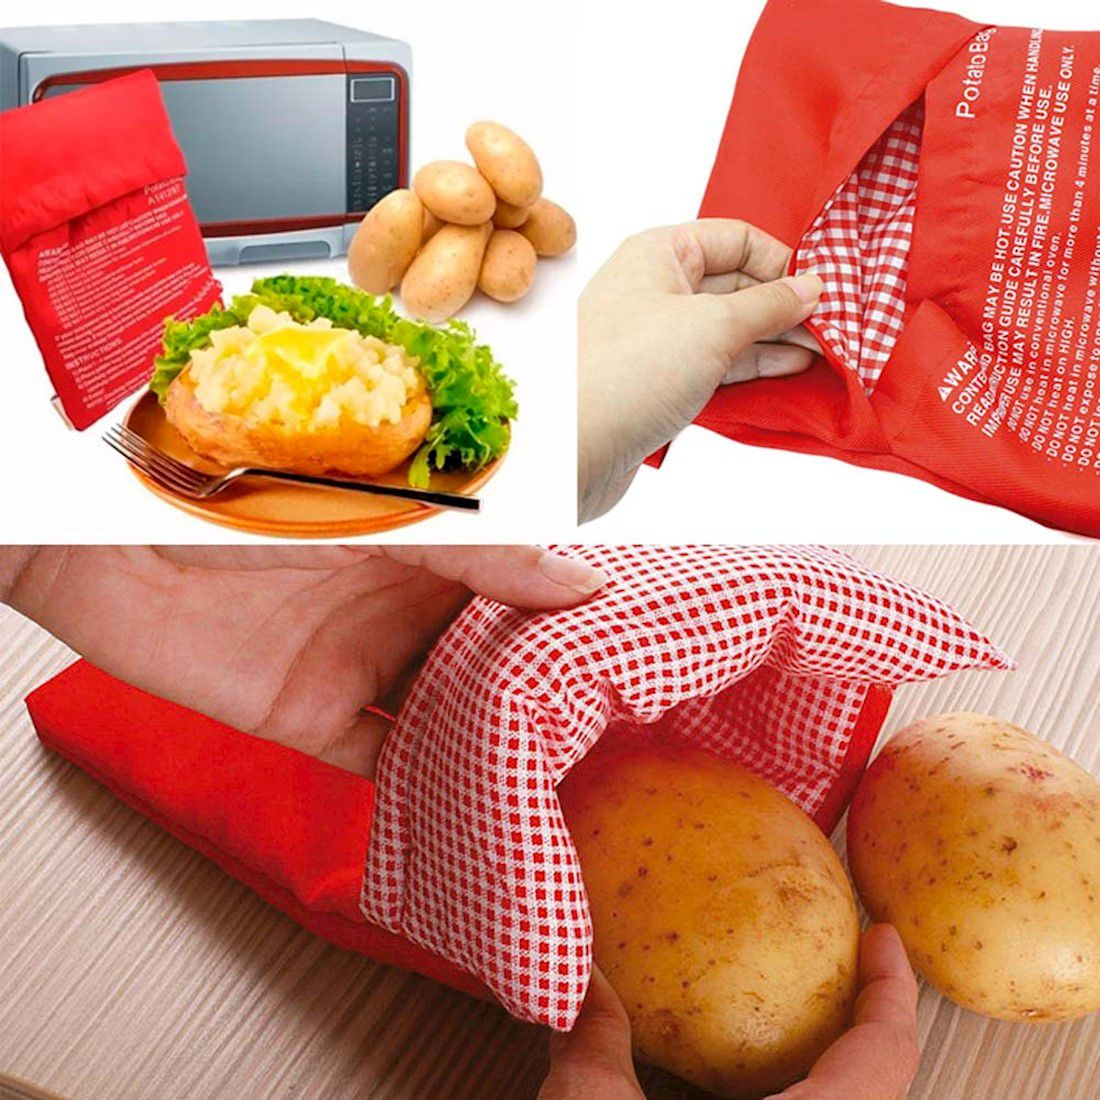 Bolsa para Microondas - Saco assar batatas